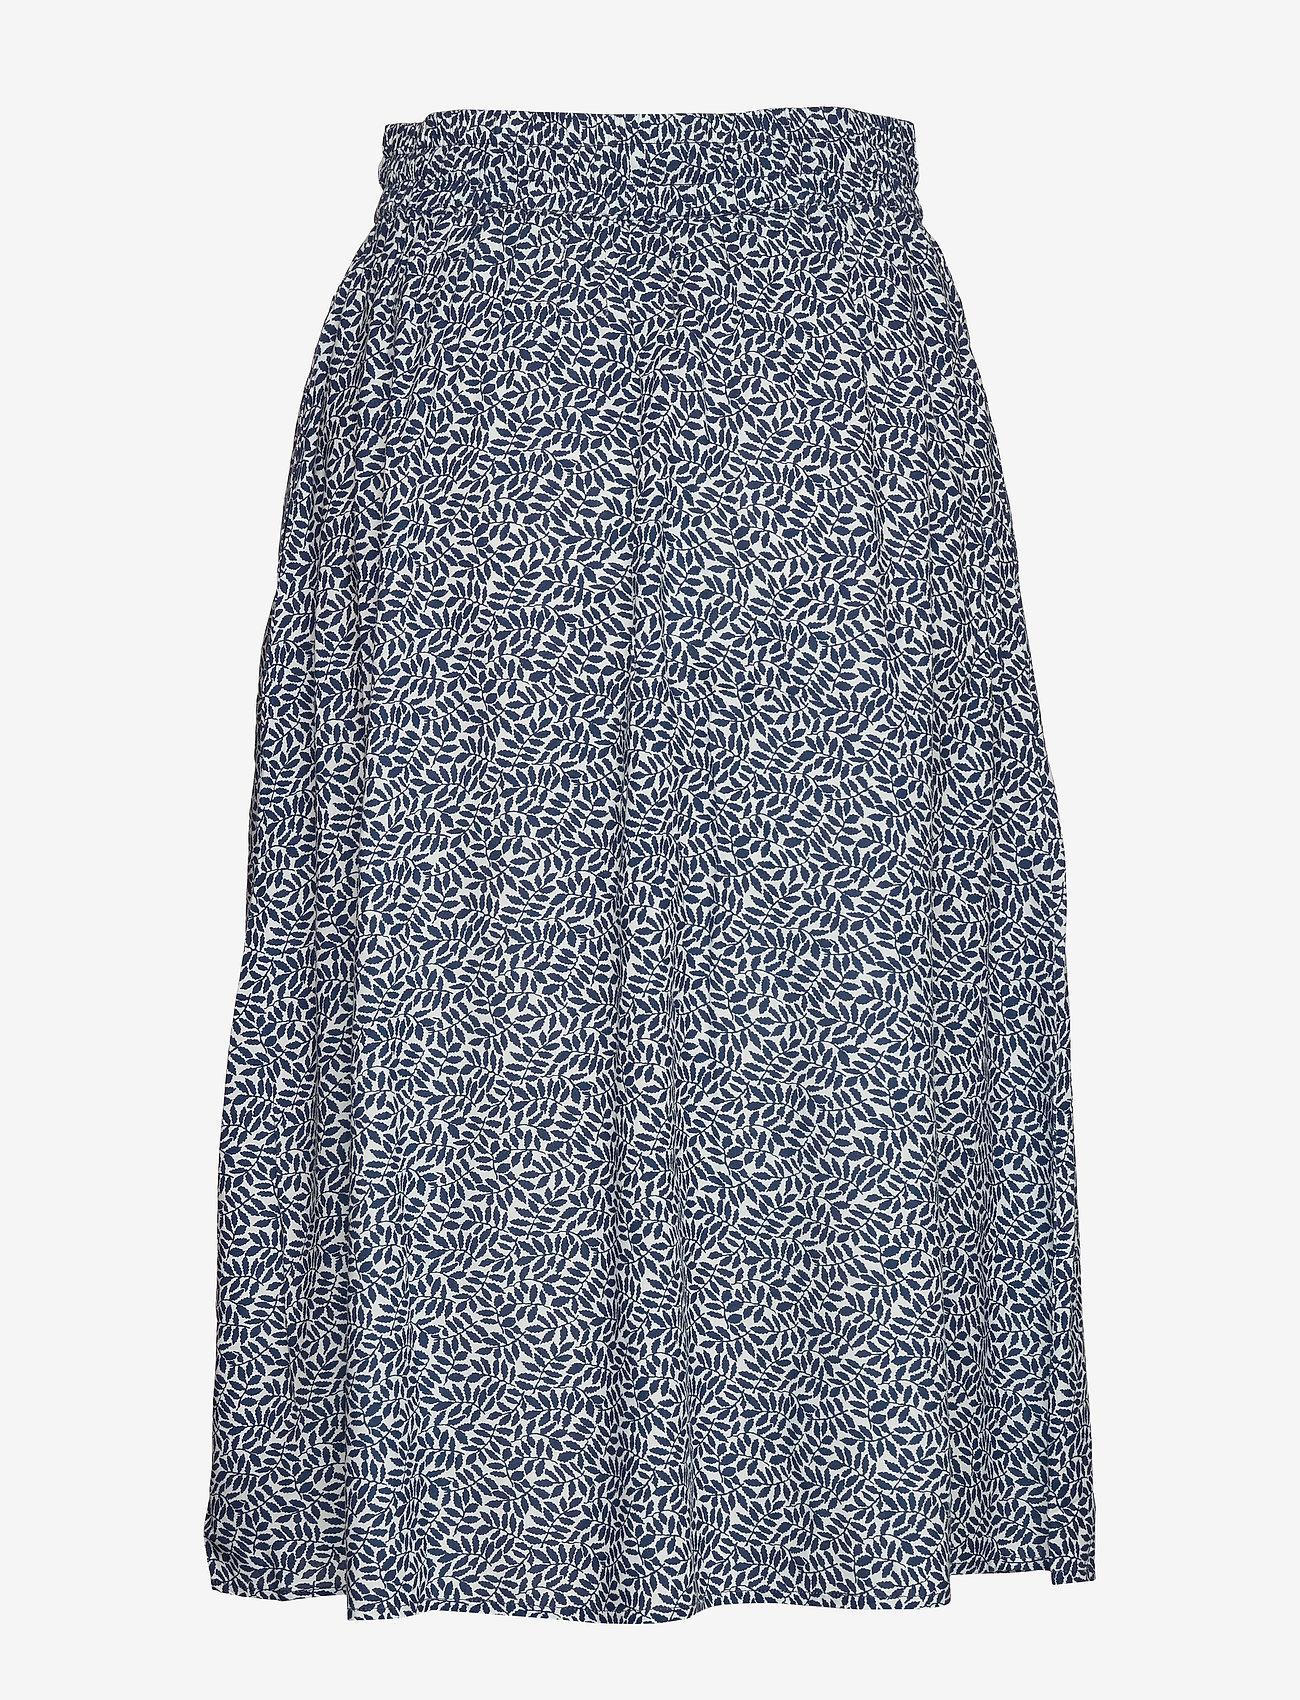 Aura Skirt Mini Leaf (Mini Leaf) - Moshi Moshi Mind 15BR3y